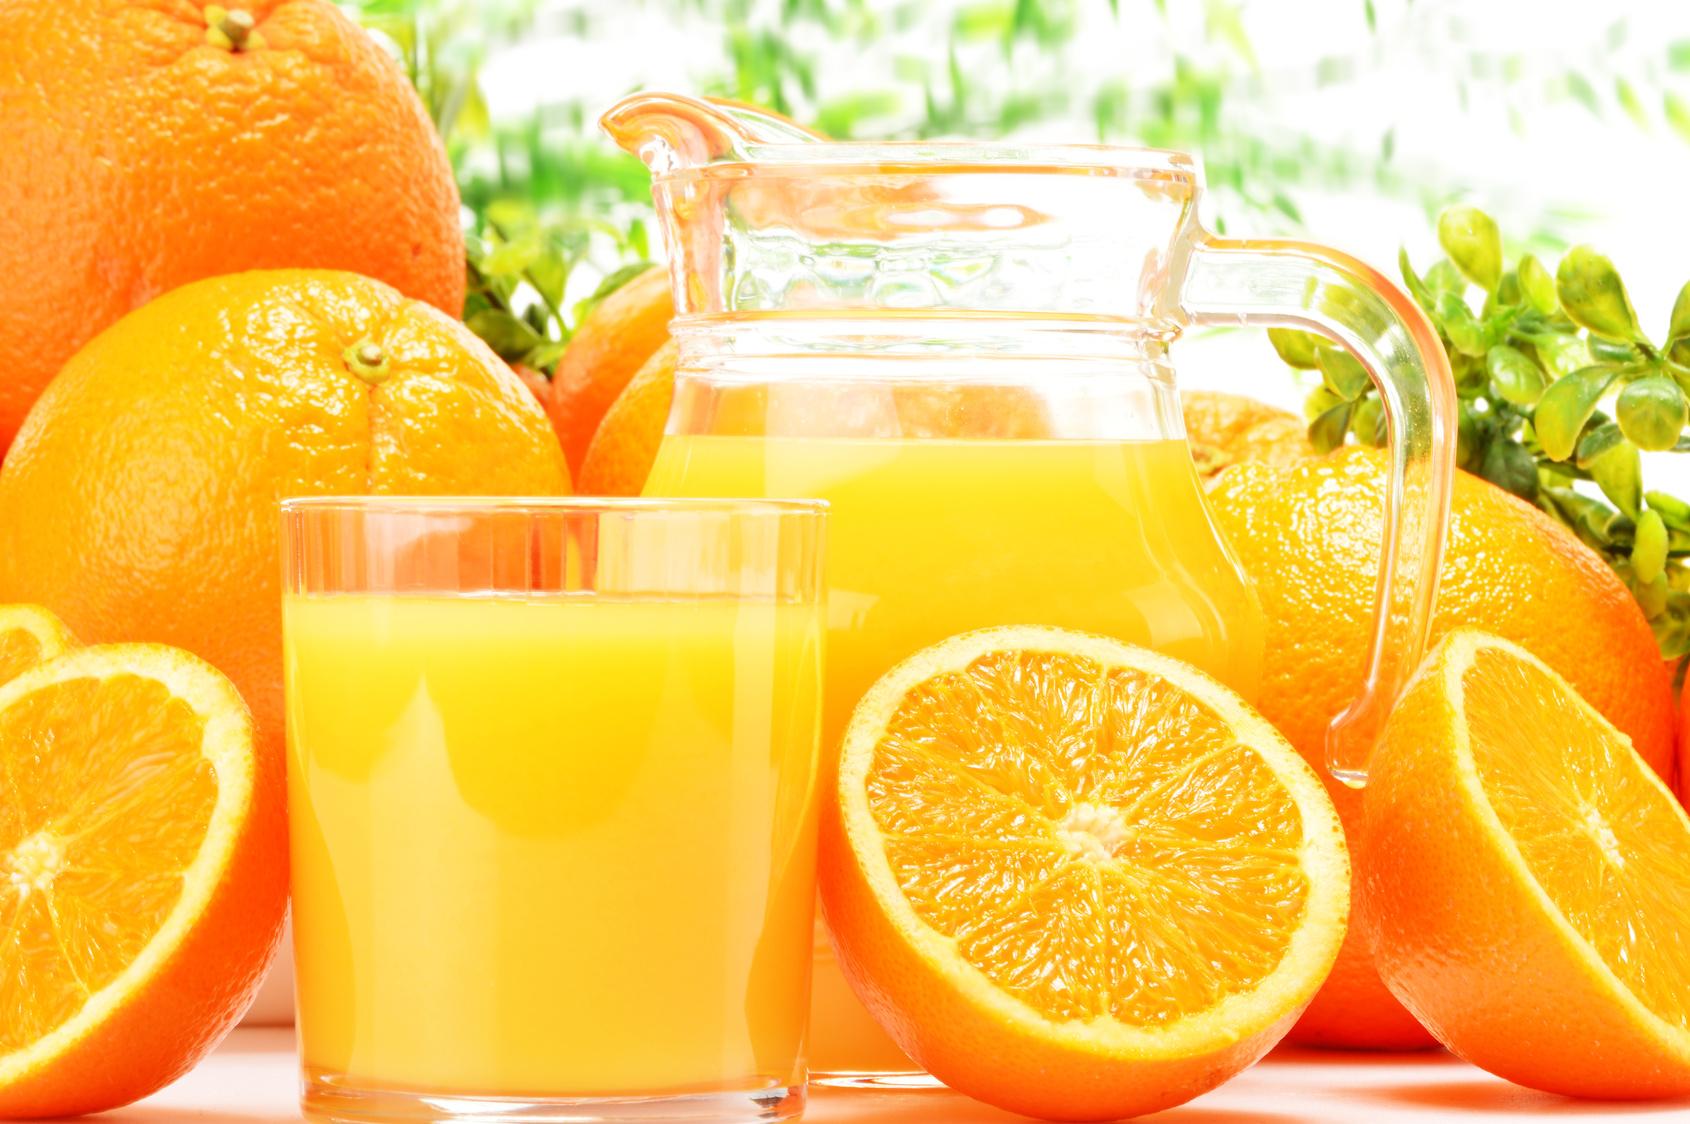 Alimentos Saudáveis para Gestantes laranja